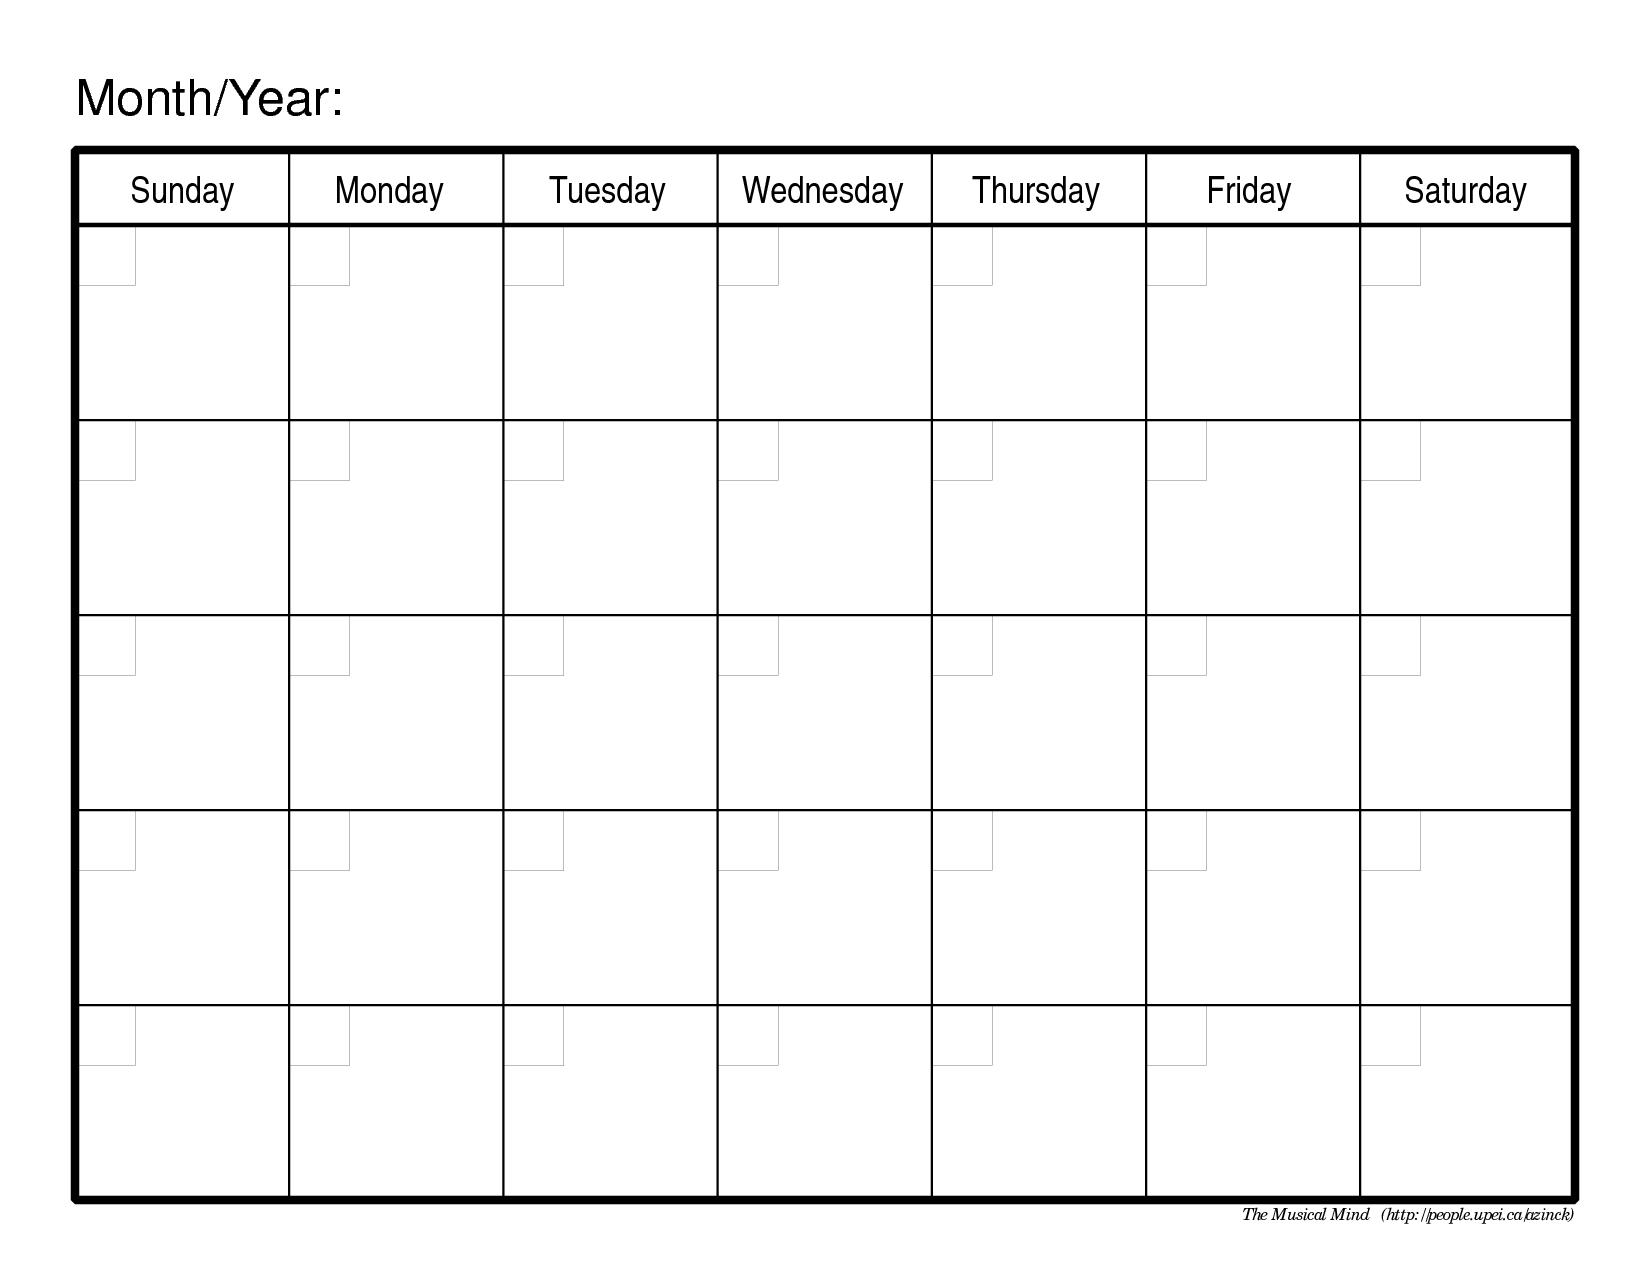 Monthly Calendar Template | Weekly Calendar Template, Free